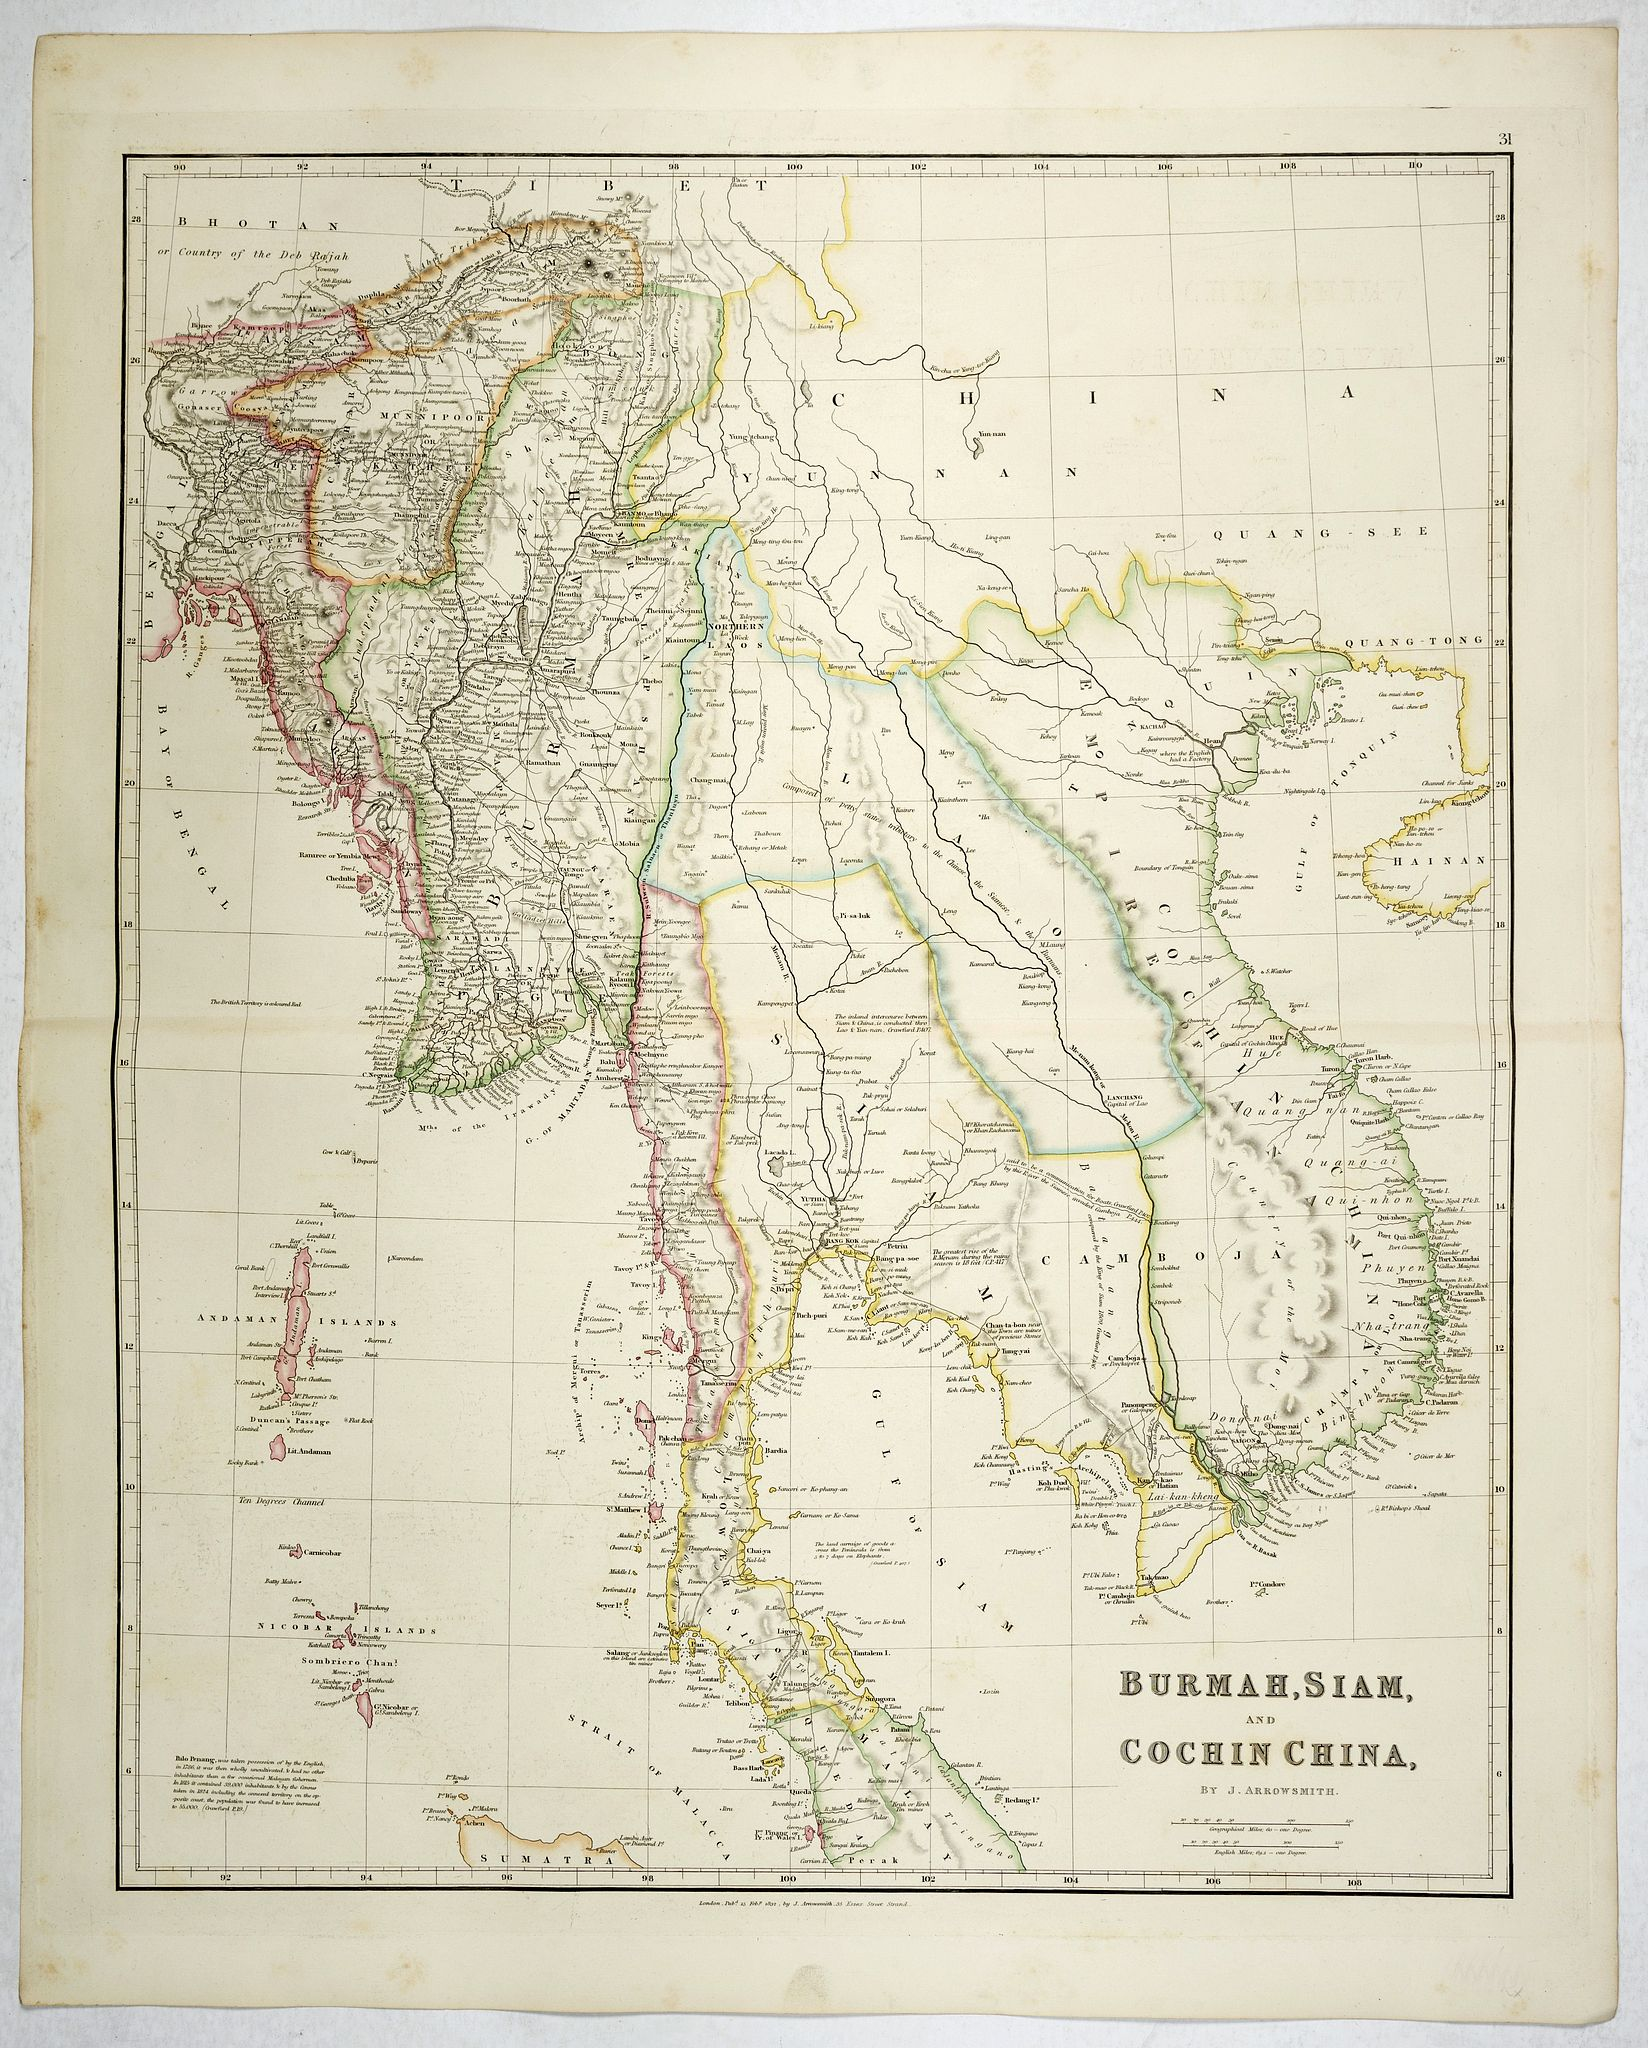 ARROWSMITH, J. -  Burmah, Siam, and Cochin China.